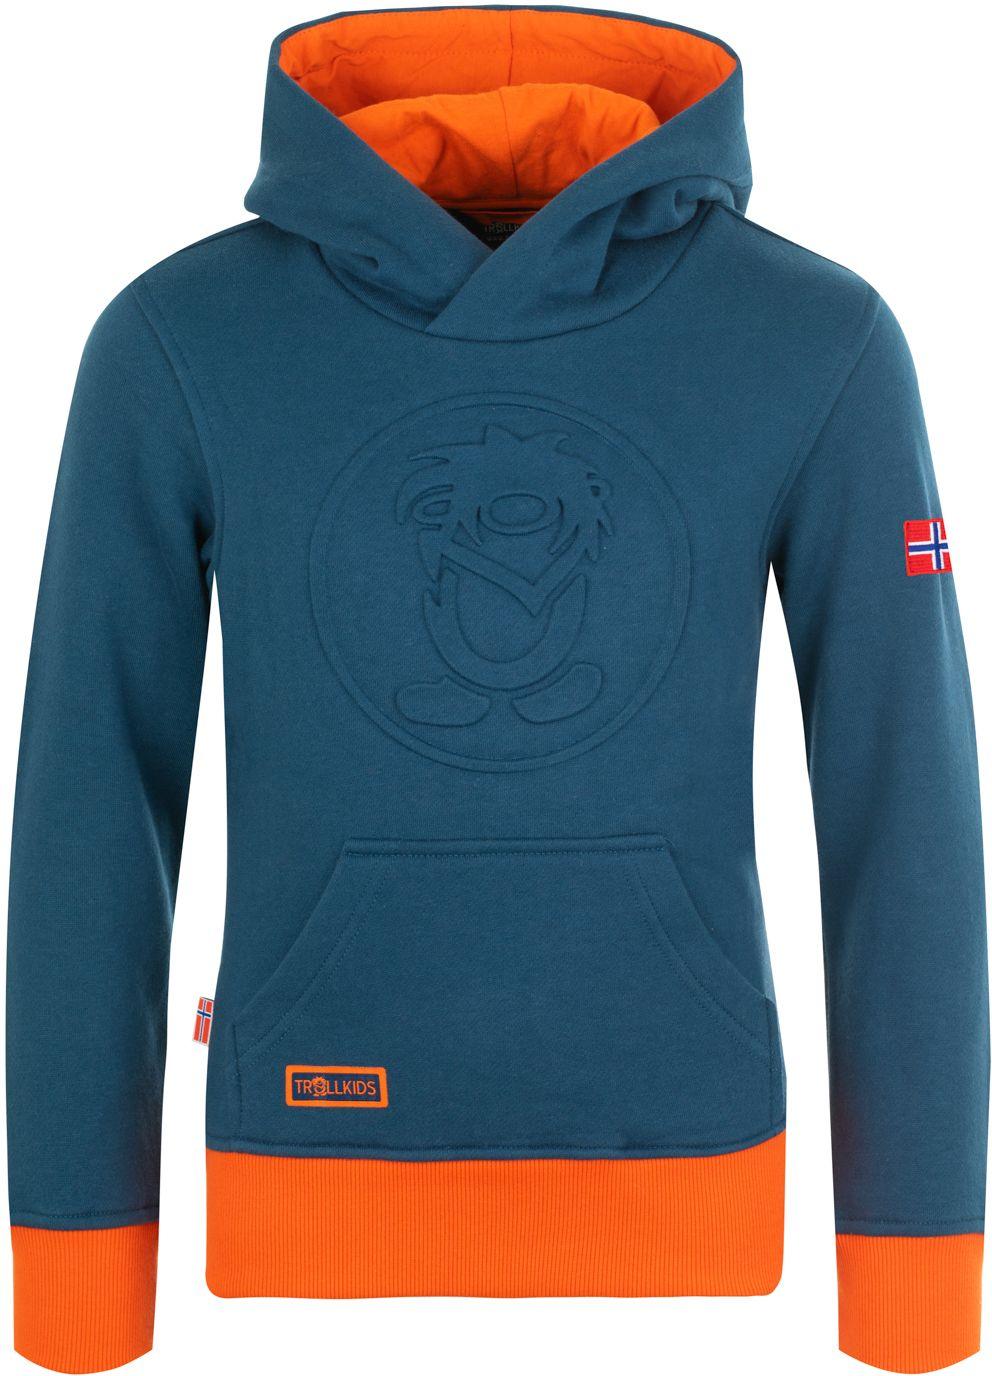 Trollkids Lillehammer Sweater mystic blue/orange